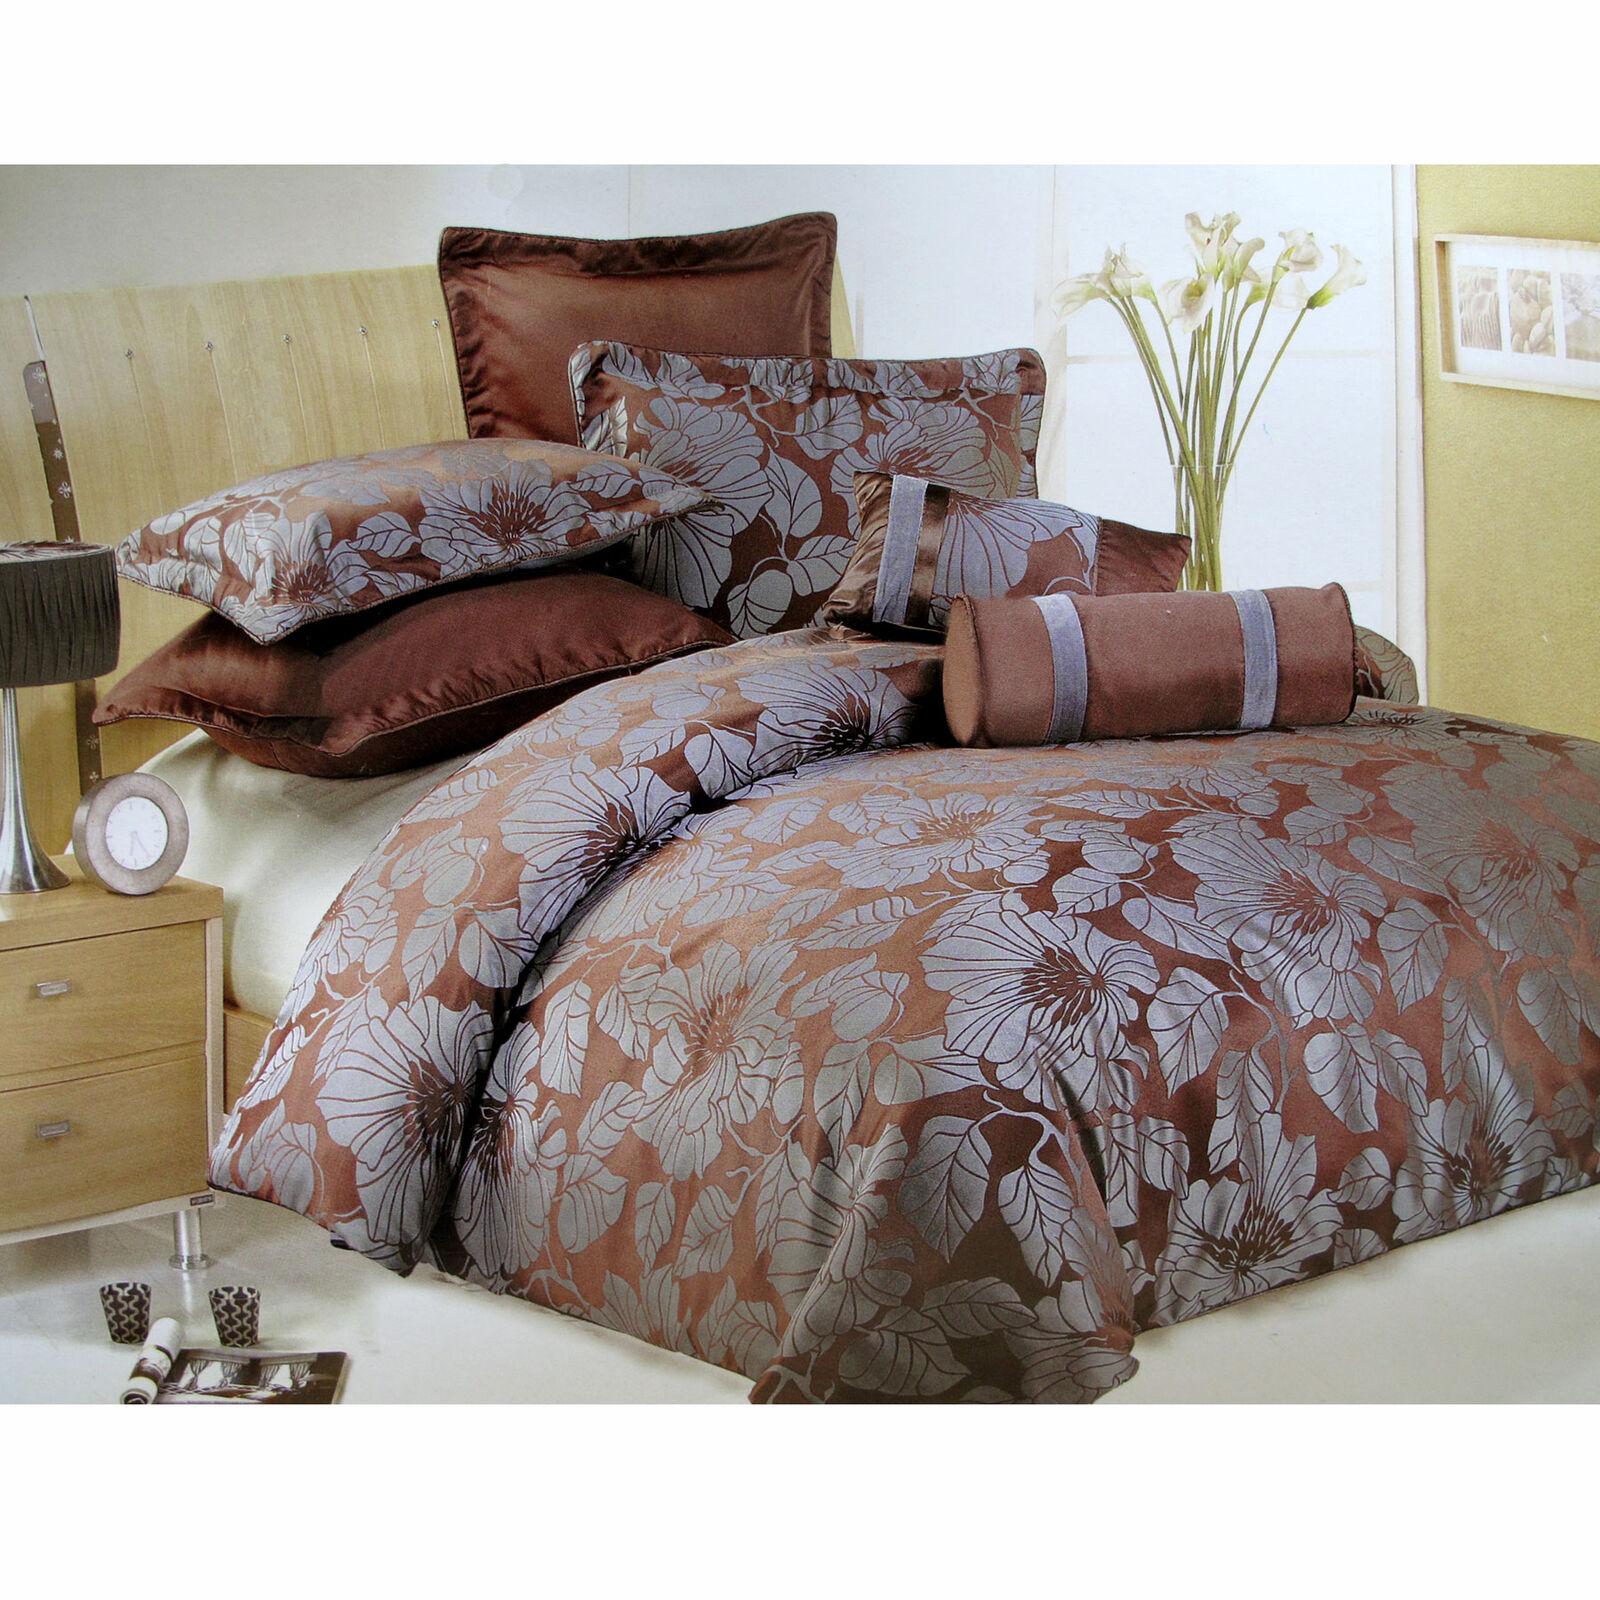 7 Pce Bliss braun Sage Floral Quilt Doona Duvet Cover Set Bed Set - QUEEN KING